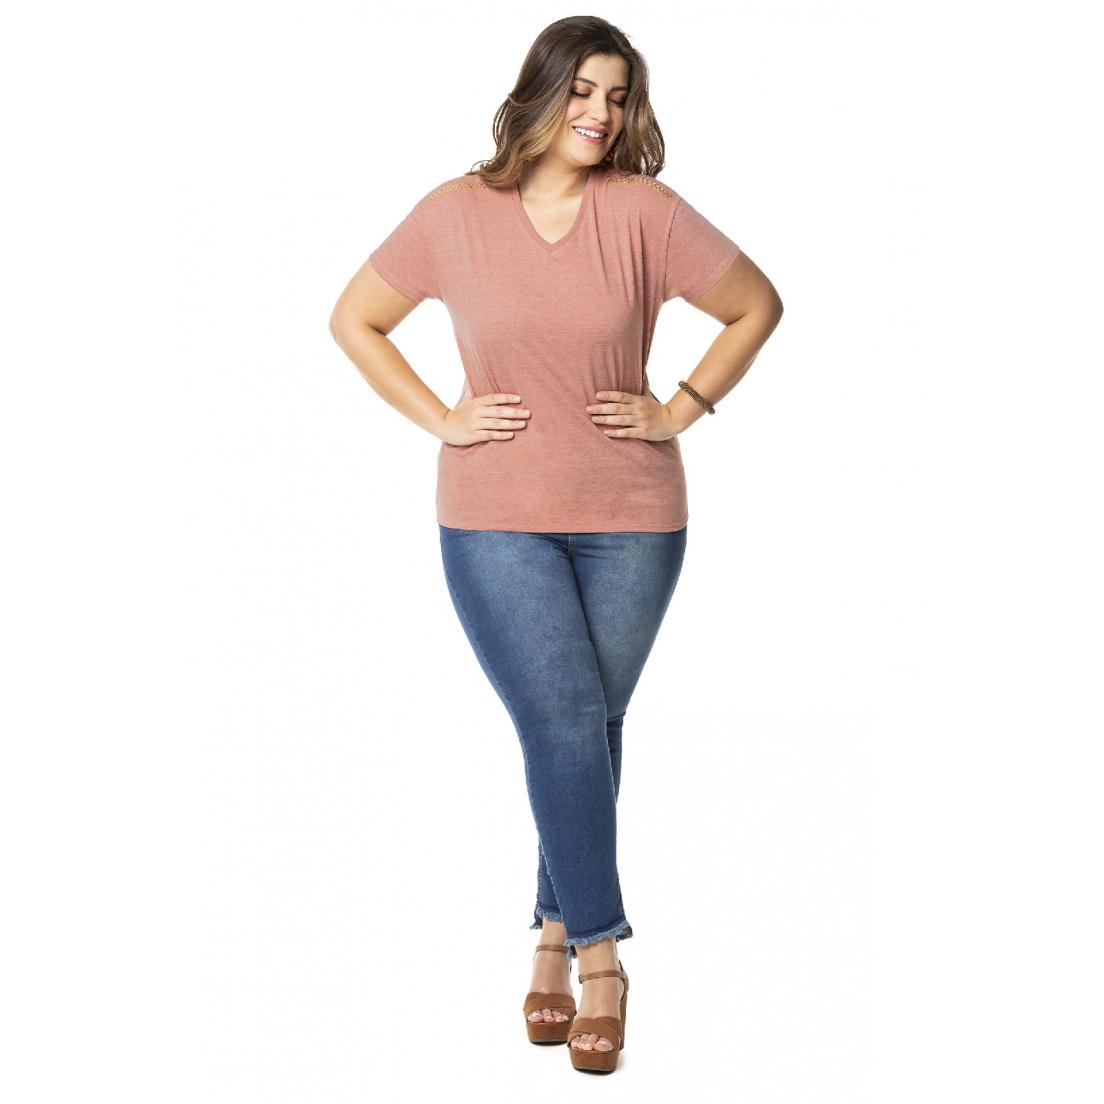 Blusa Plus Size Feminina Strass - Lecimar